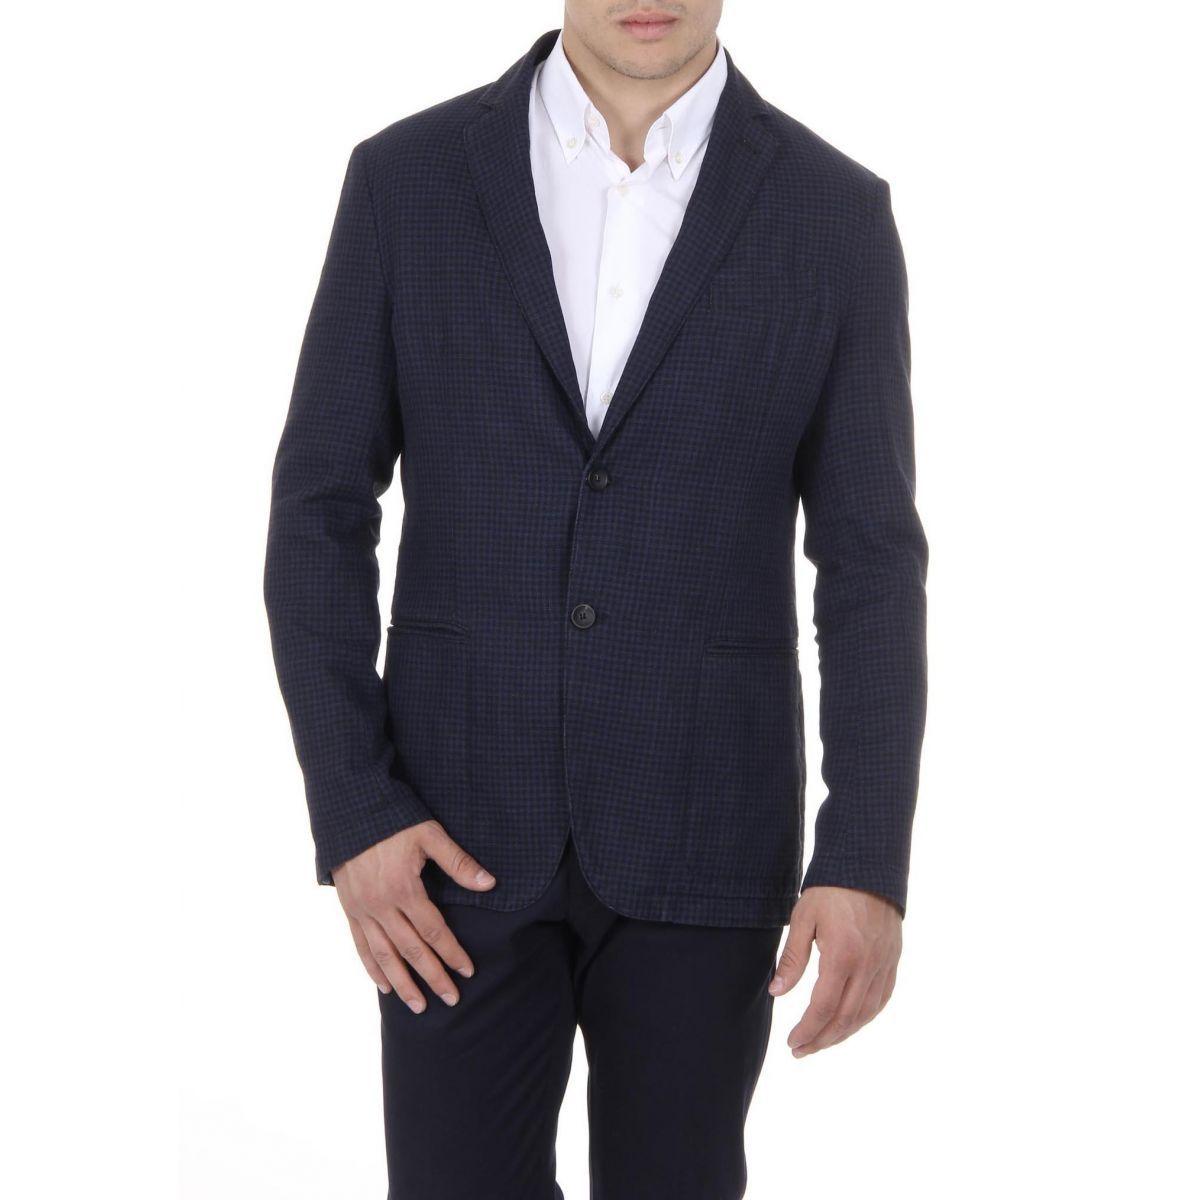 Armani Collezioni Mens Jacket TCG070 TCS70 922